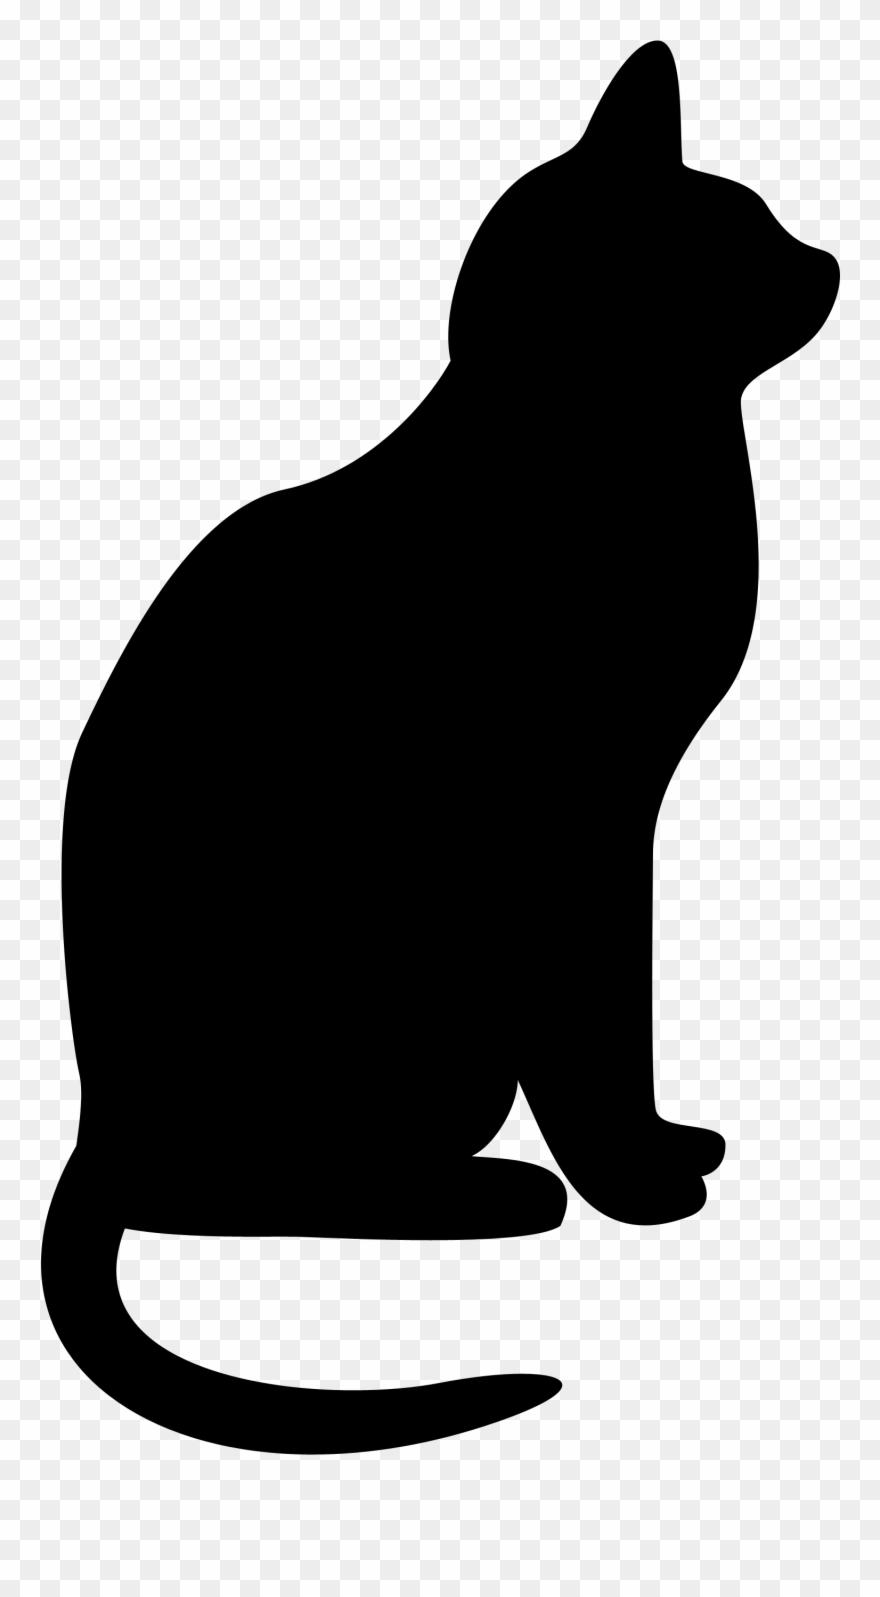 Black cat silhouette clipart vector stock Cats Clipart Silhouette Clip Art Transparent Library - Black Cat ... vector stock